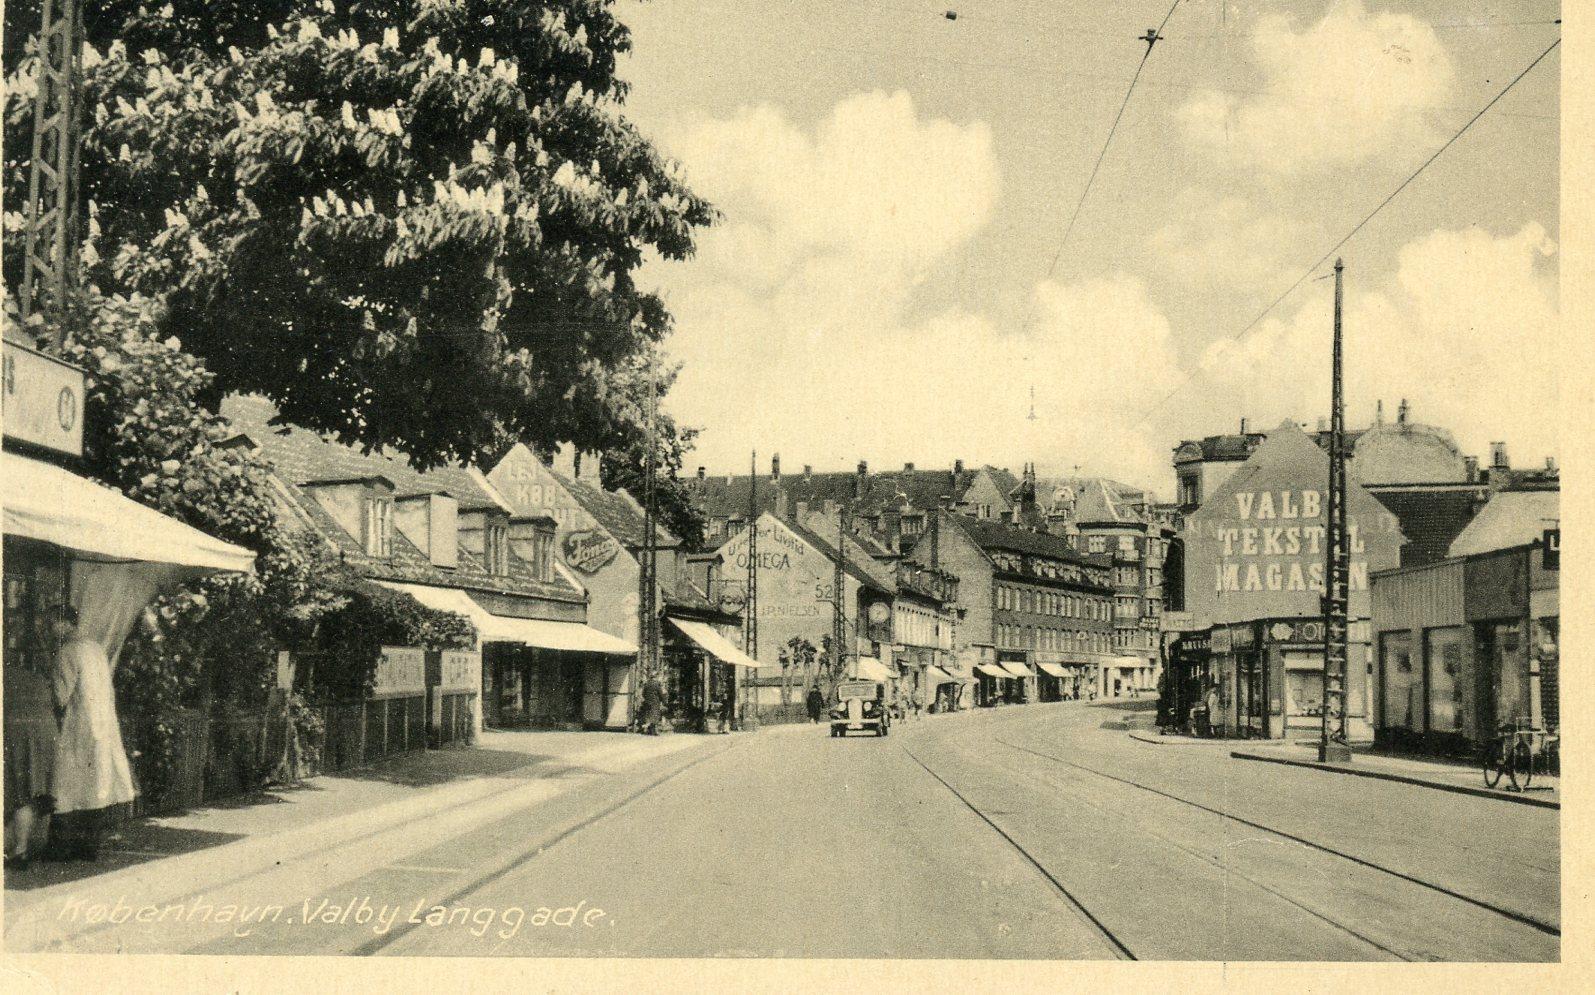 PostkortValbyLanggade